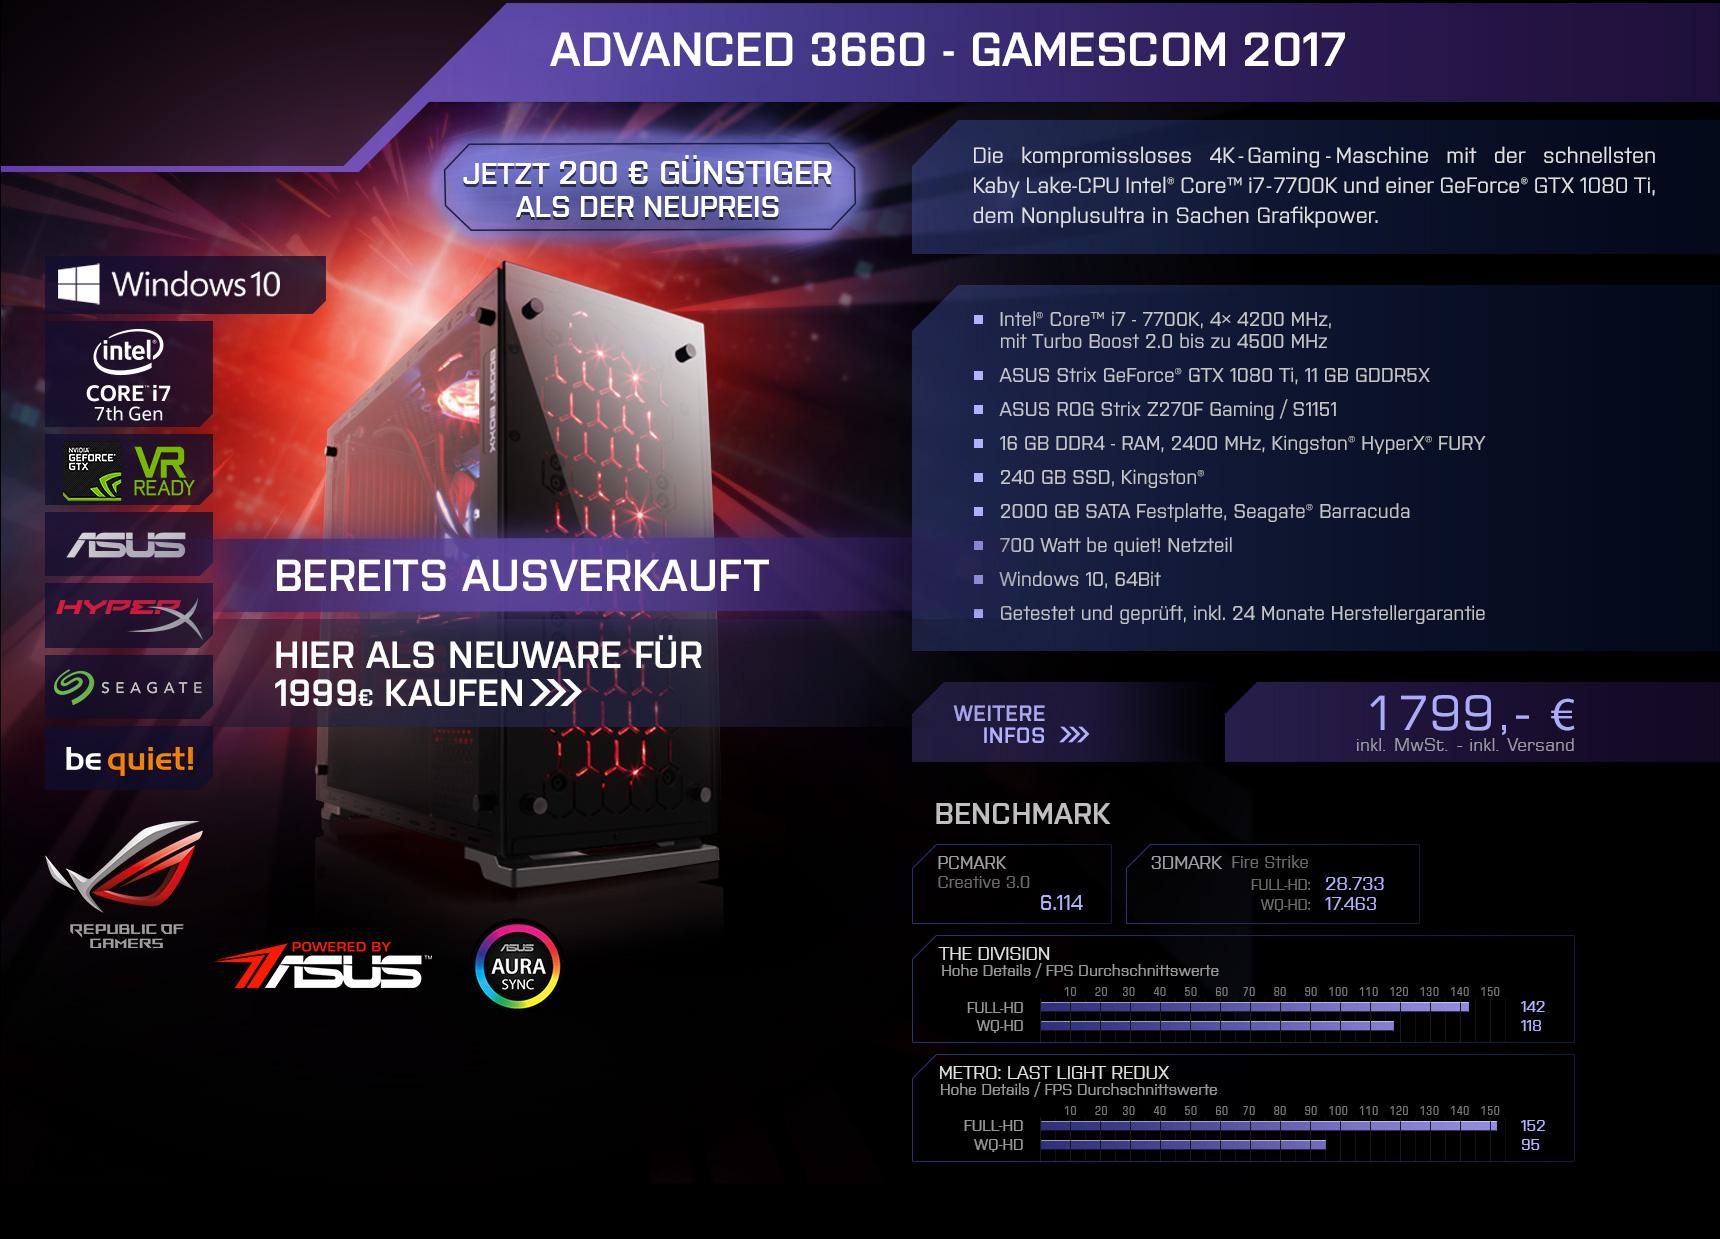 BoostBoxx Advanced 3660